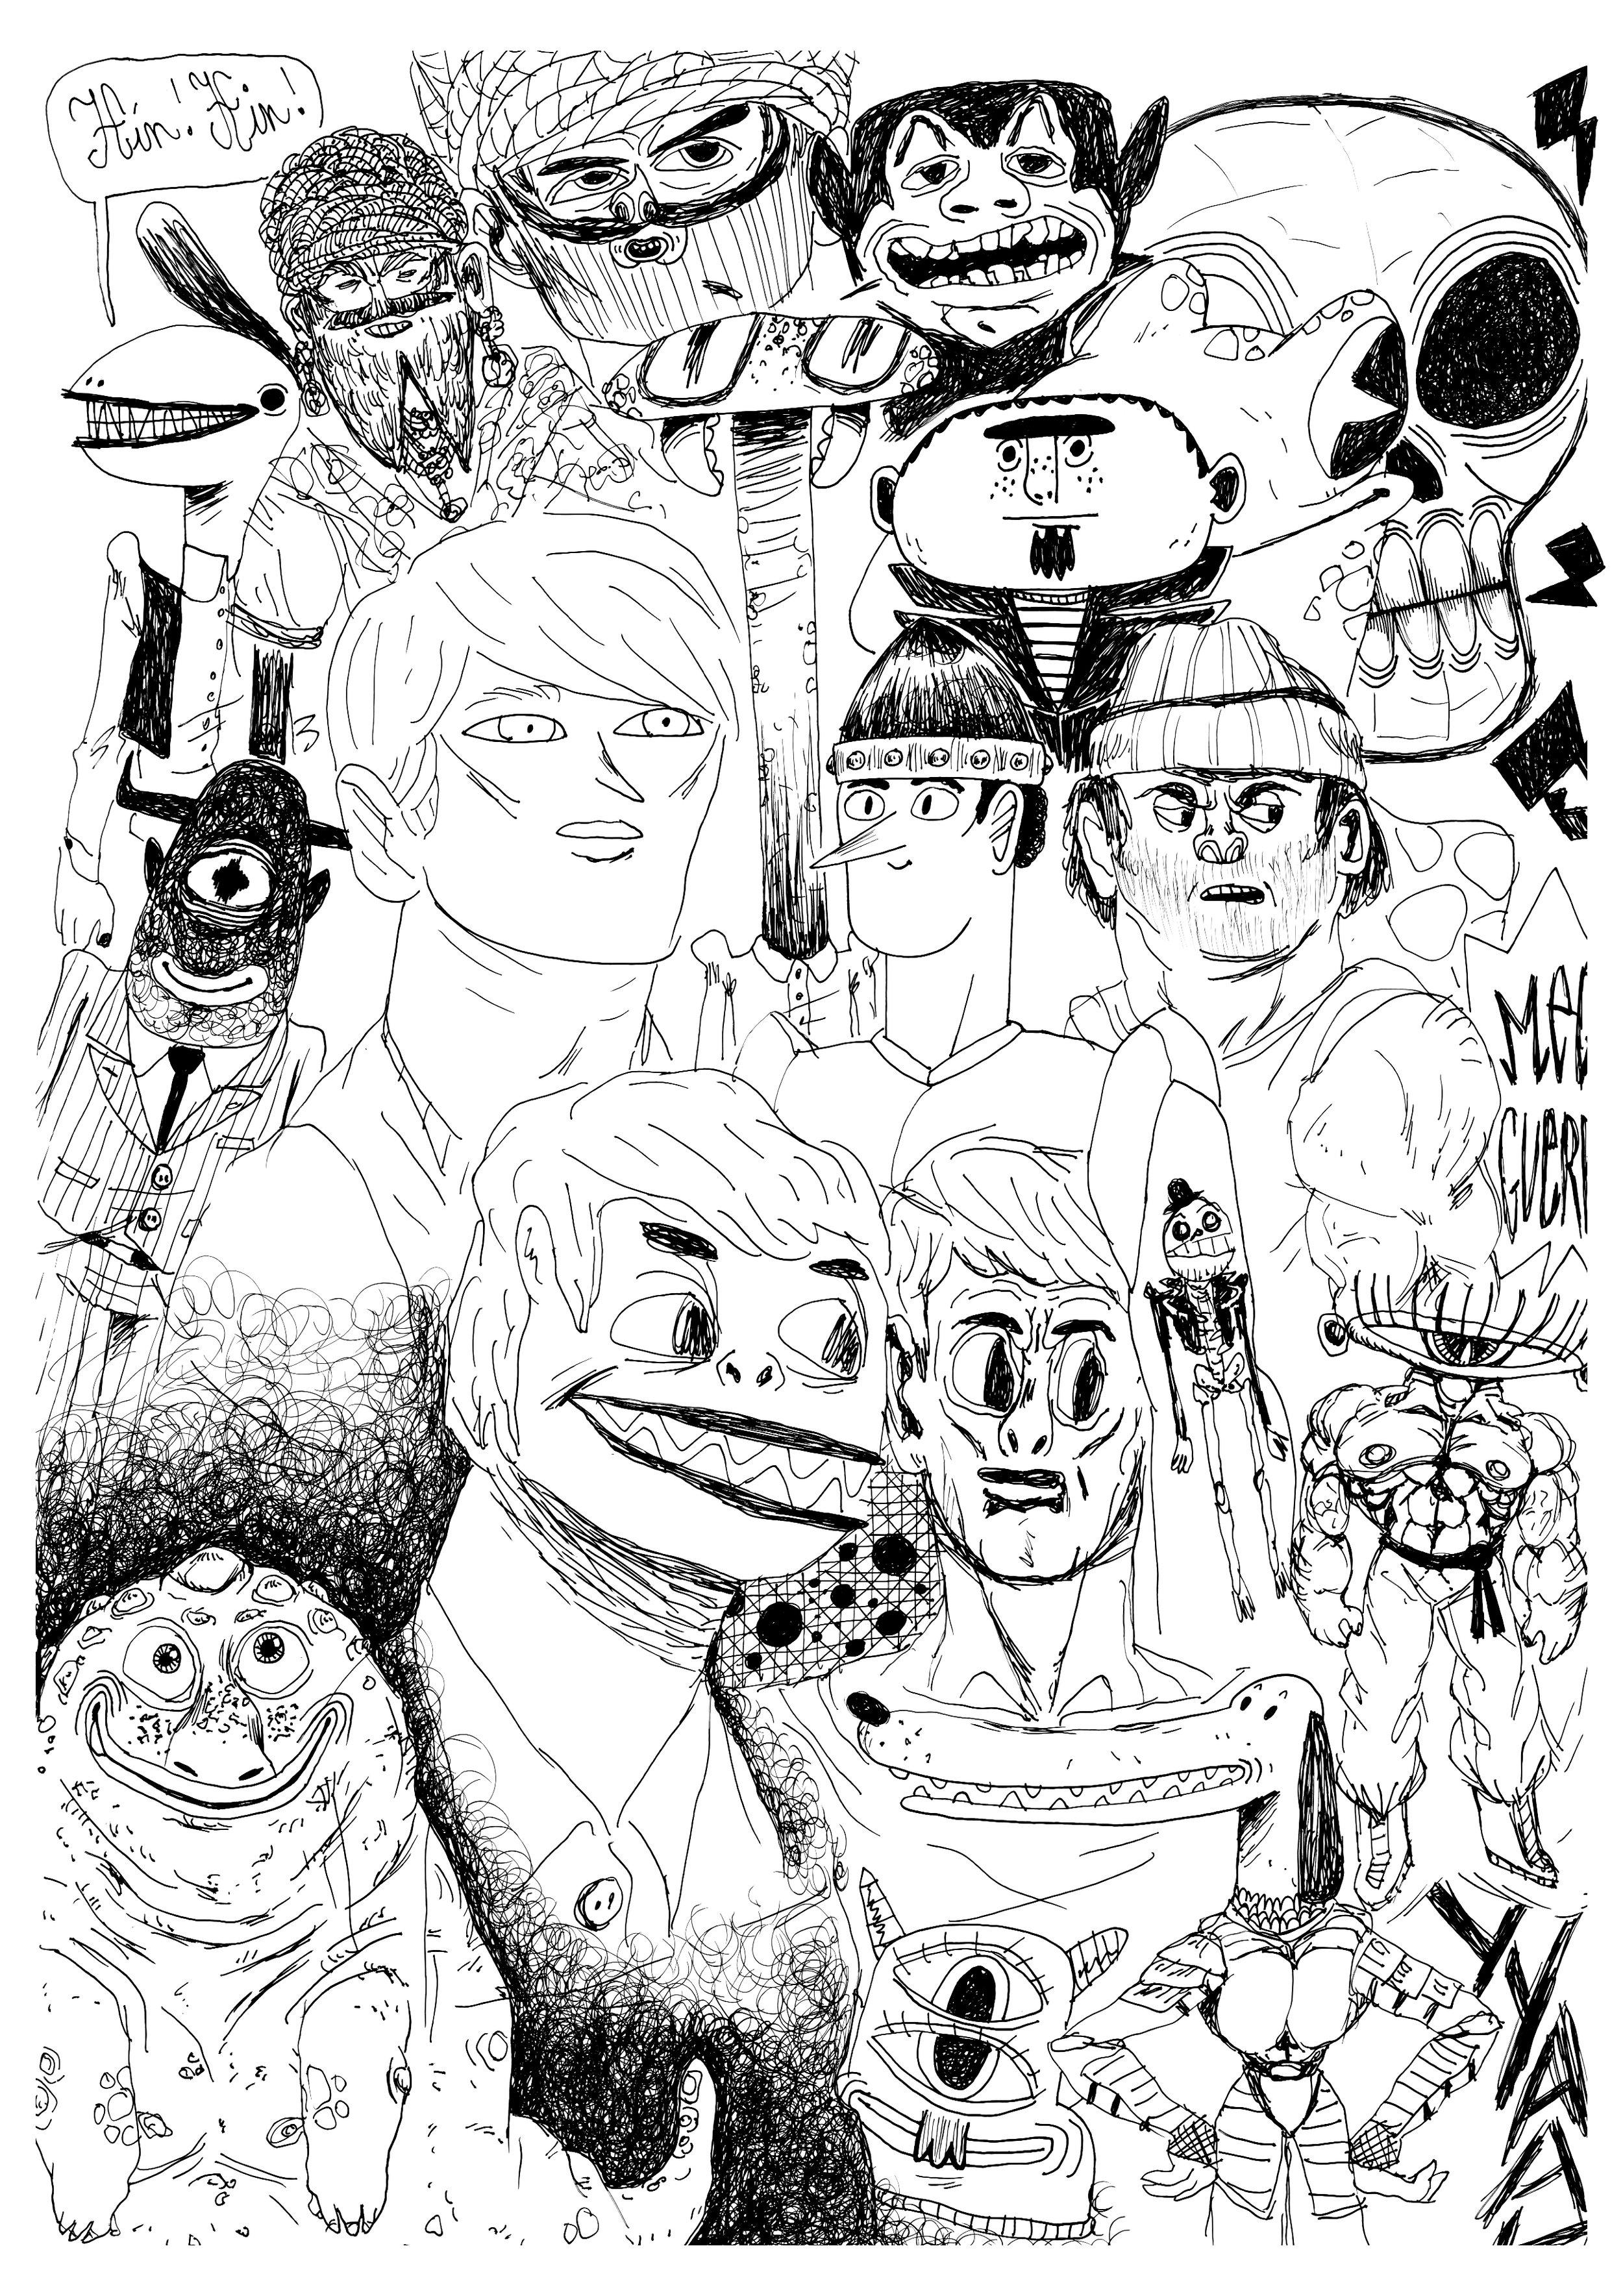 Pascal_Zaffiro_Doodle_36.jpg